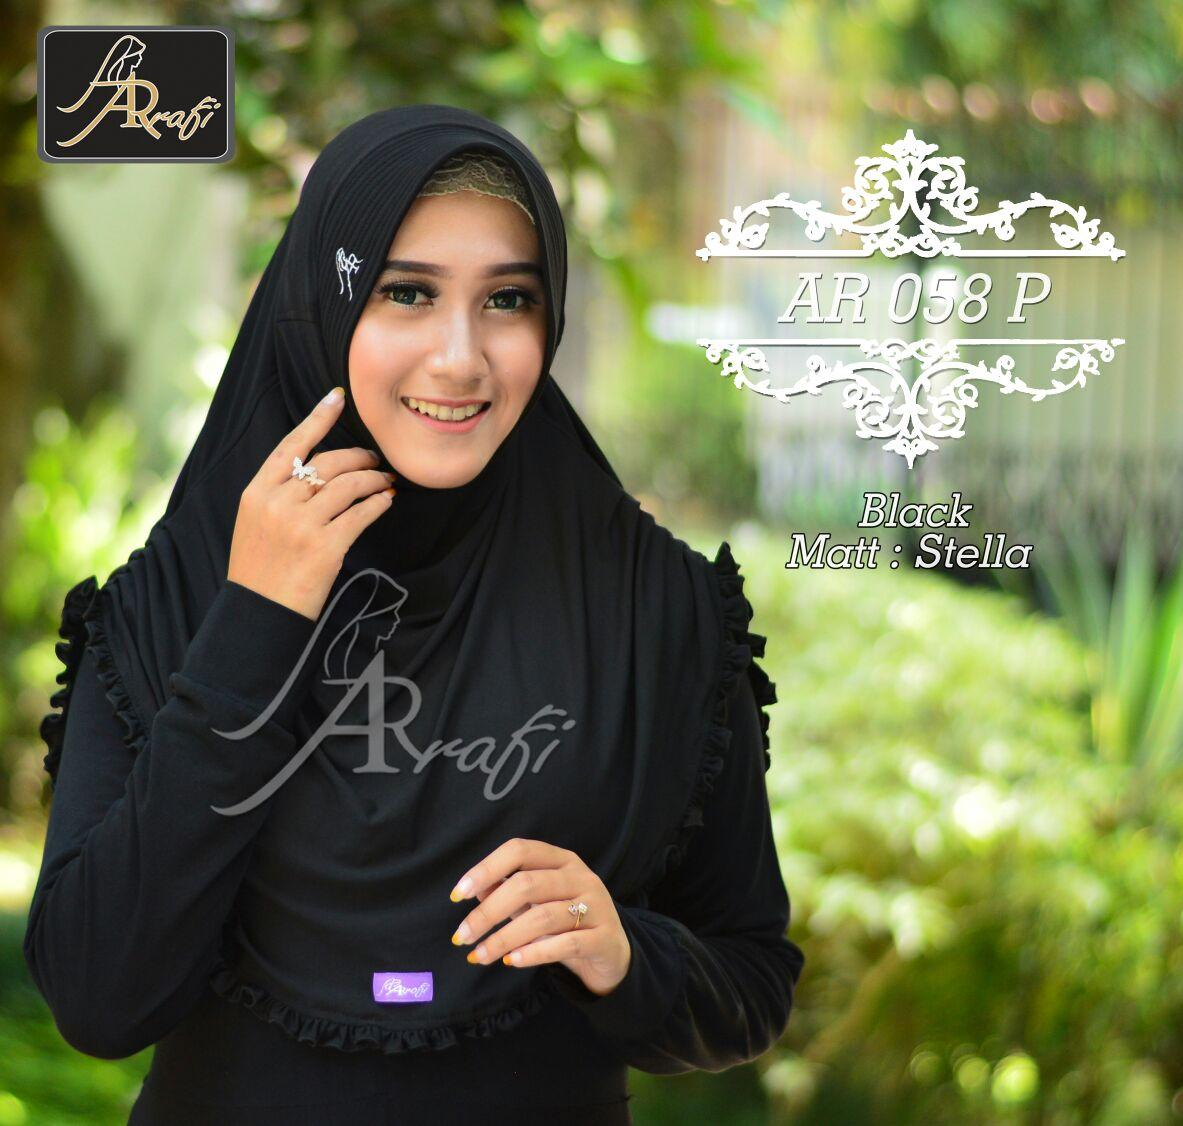 jilbab instan Rumana Rempel Arrafi (warna Hitam) - AR58p - hijab kerudung khimar bergo scarf baju muslim blouse dress kemeja pakaian fashion gamis wanita